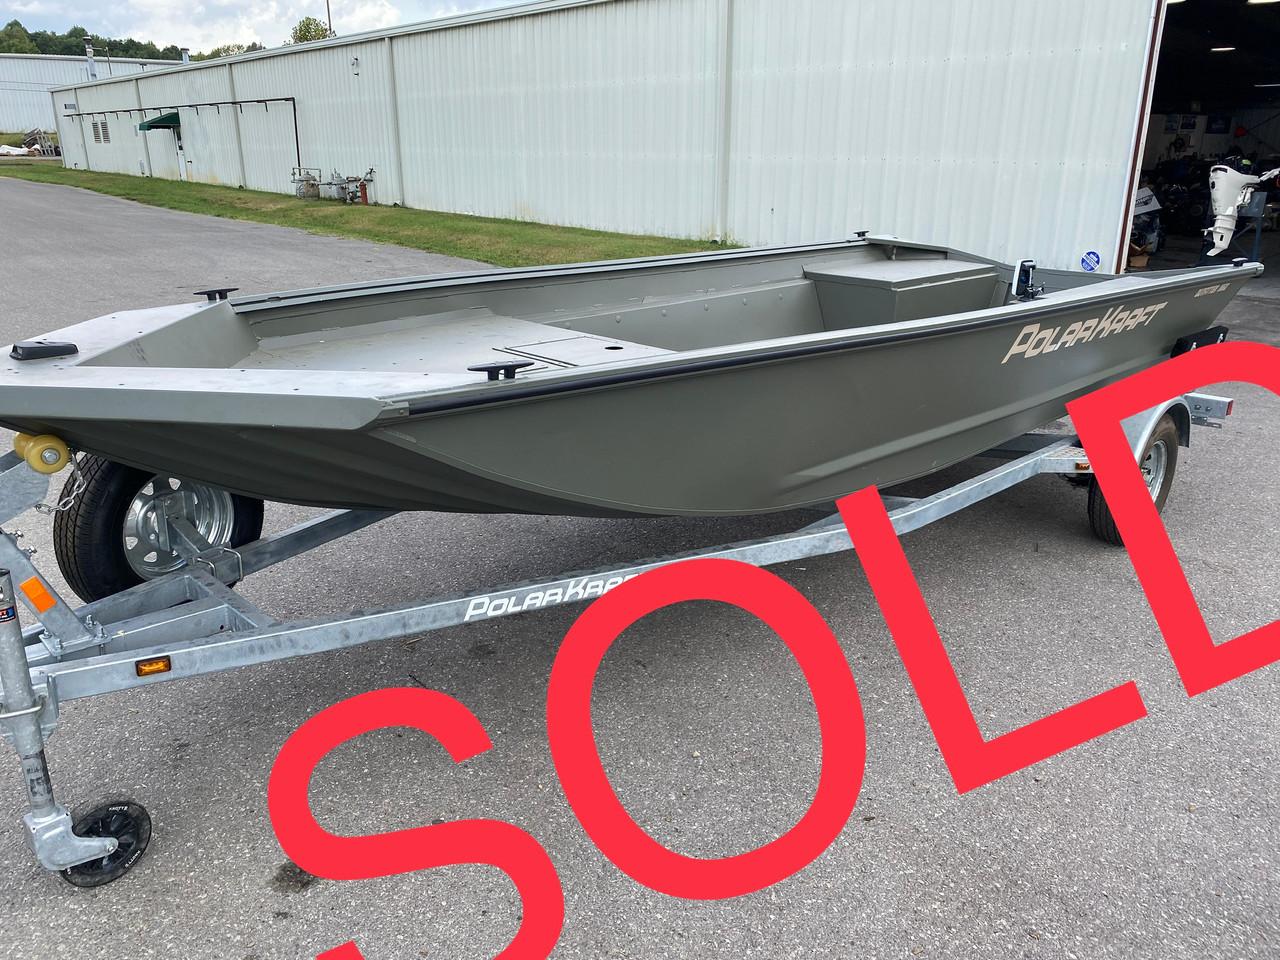 2018 PolarKraft Outfitter 1860LW 18' Aluminum Jon Boat w/ Single Axel Trailer